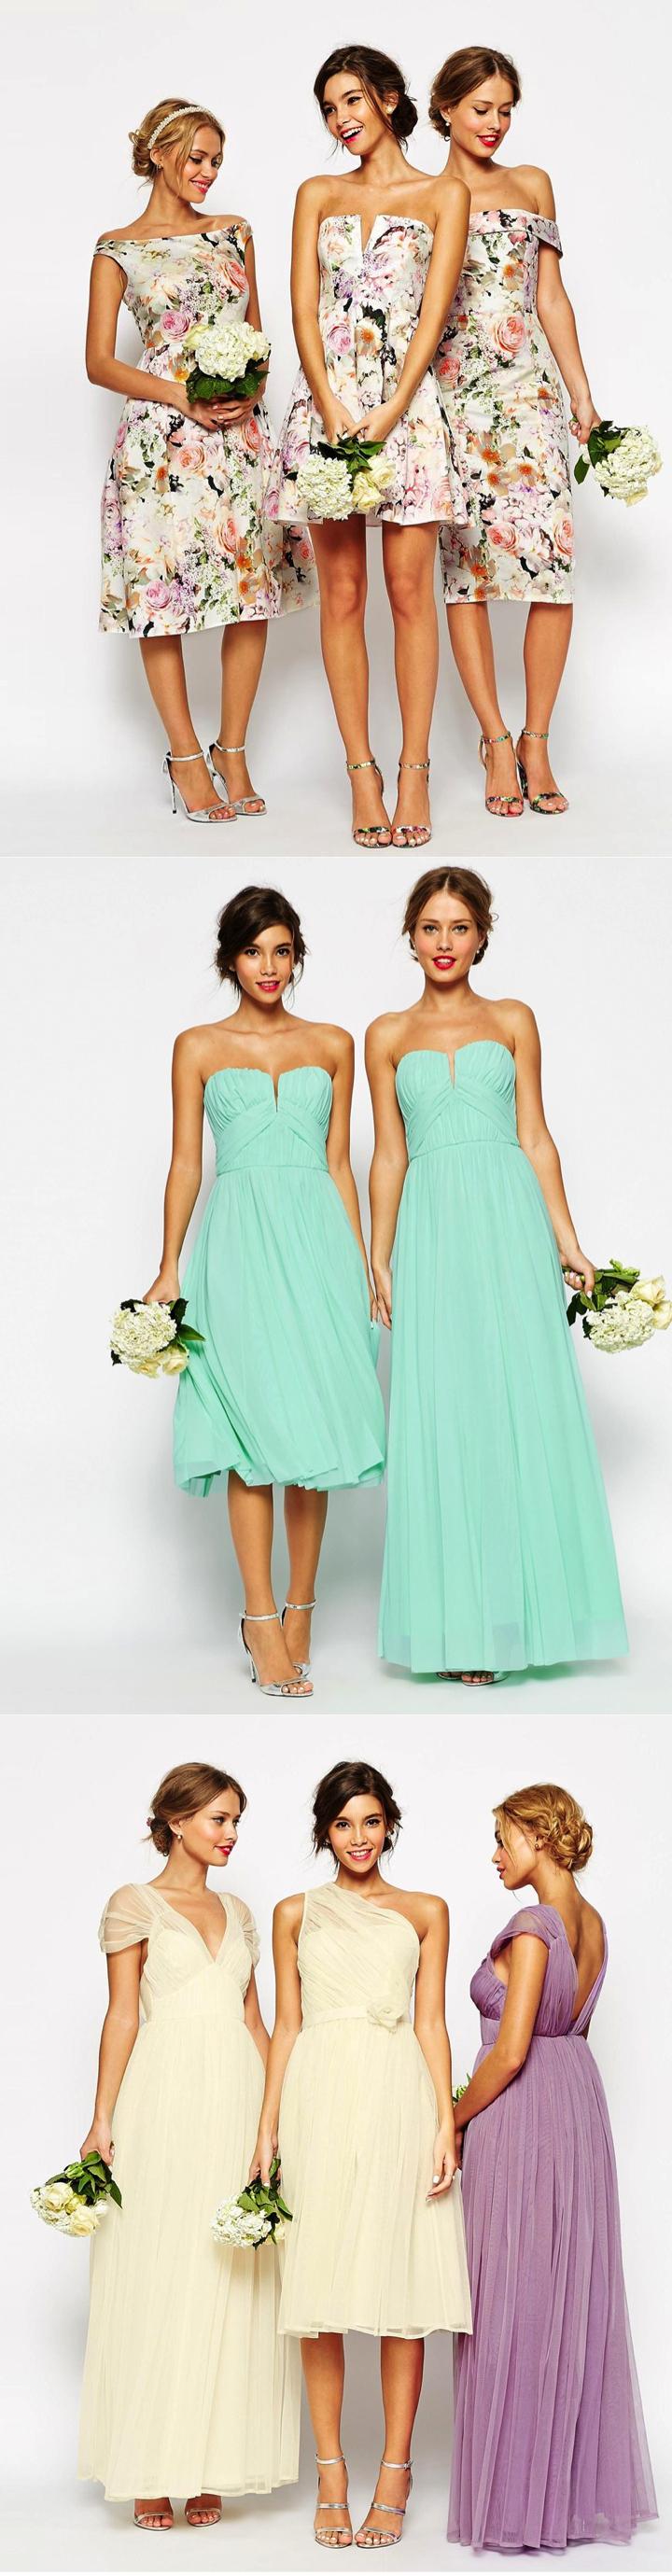 Bridesmaid dresses that wont break the bank banks wedding and bridesmaid dresses that wont break the bank banks wedding and weddings ombrellifo Images